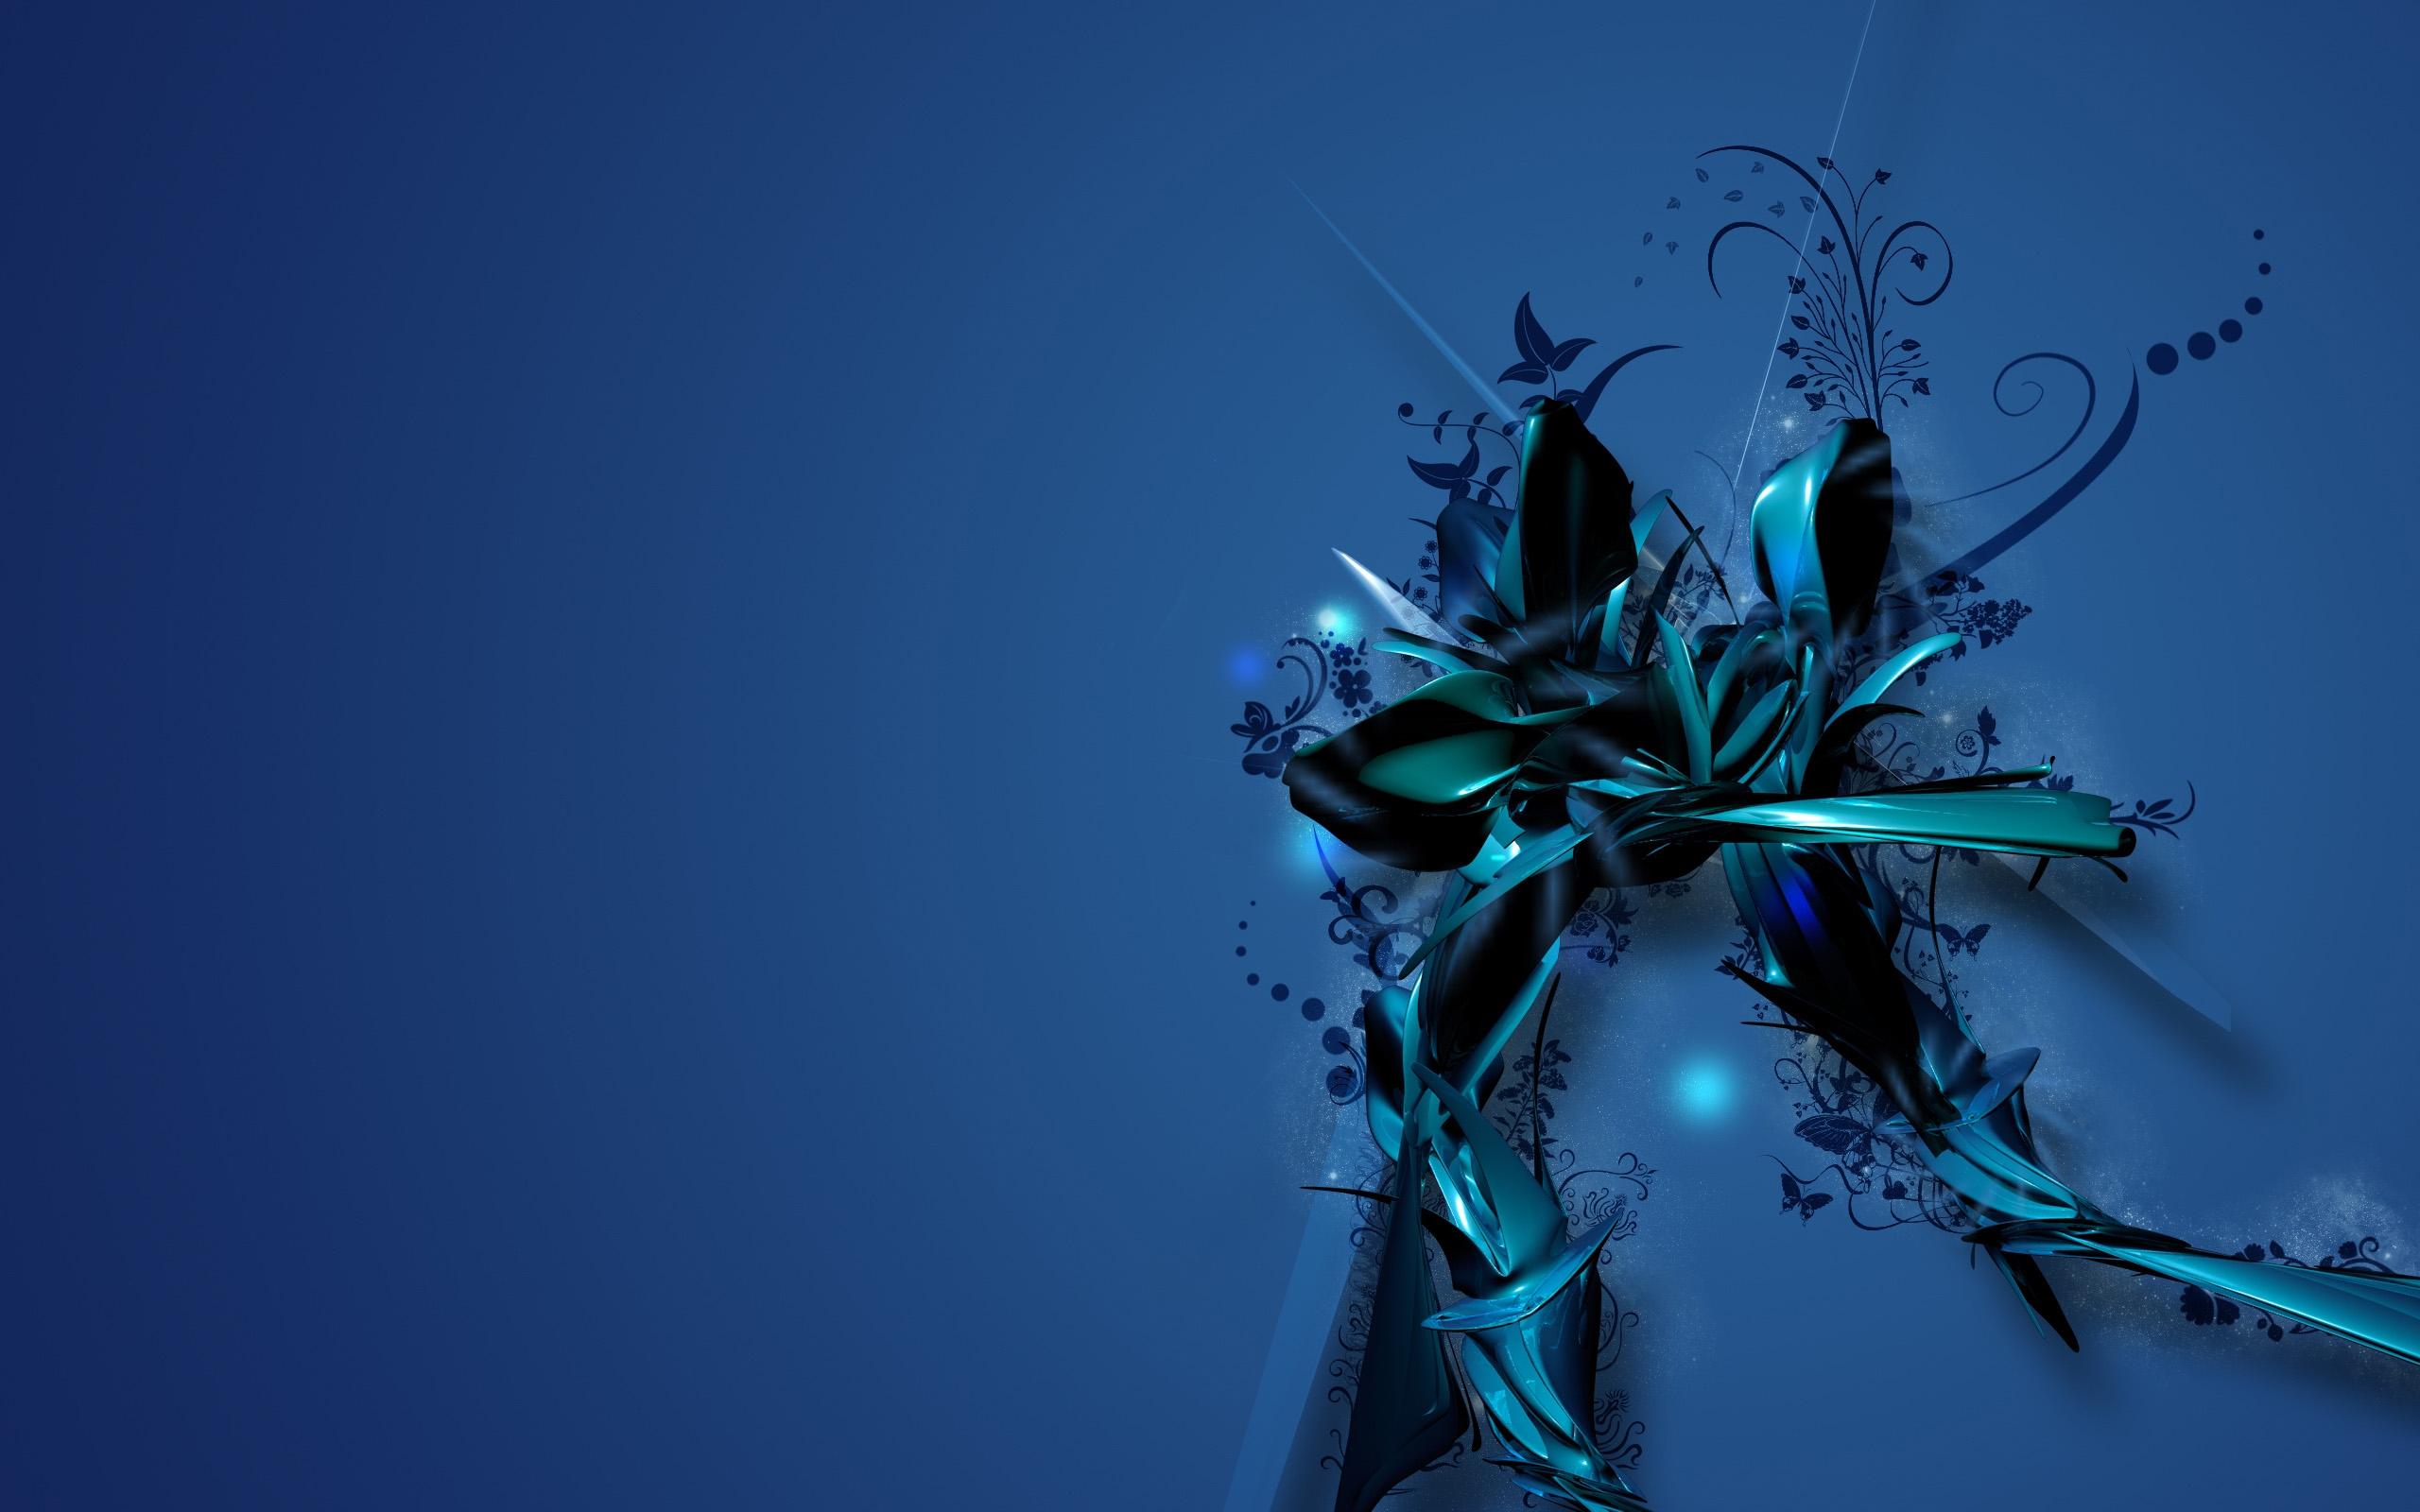 Papel De Parede Azul Borboleta Vetor 2560×1600 Wallhaven  -> Borboleta Vetor